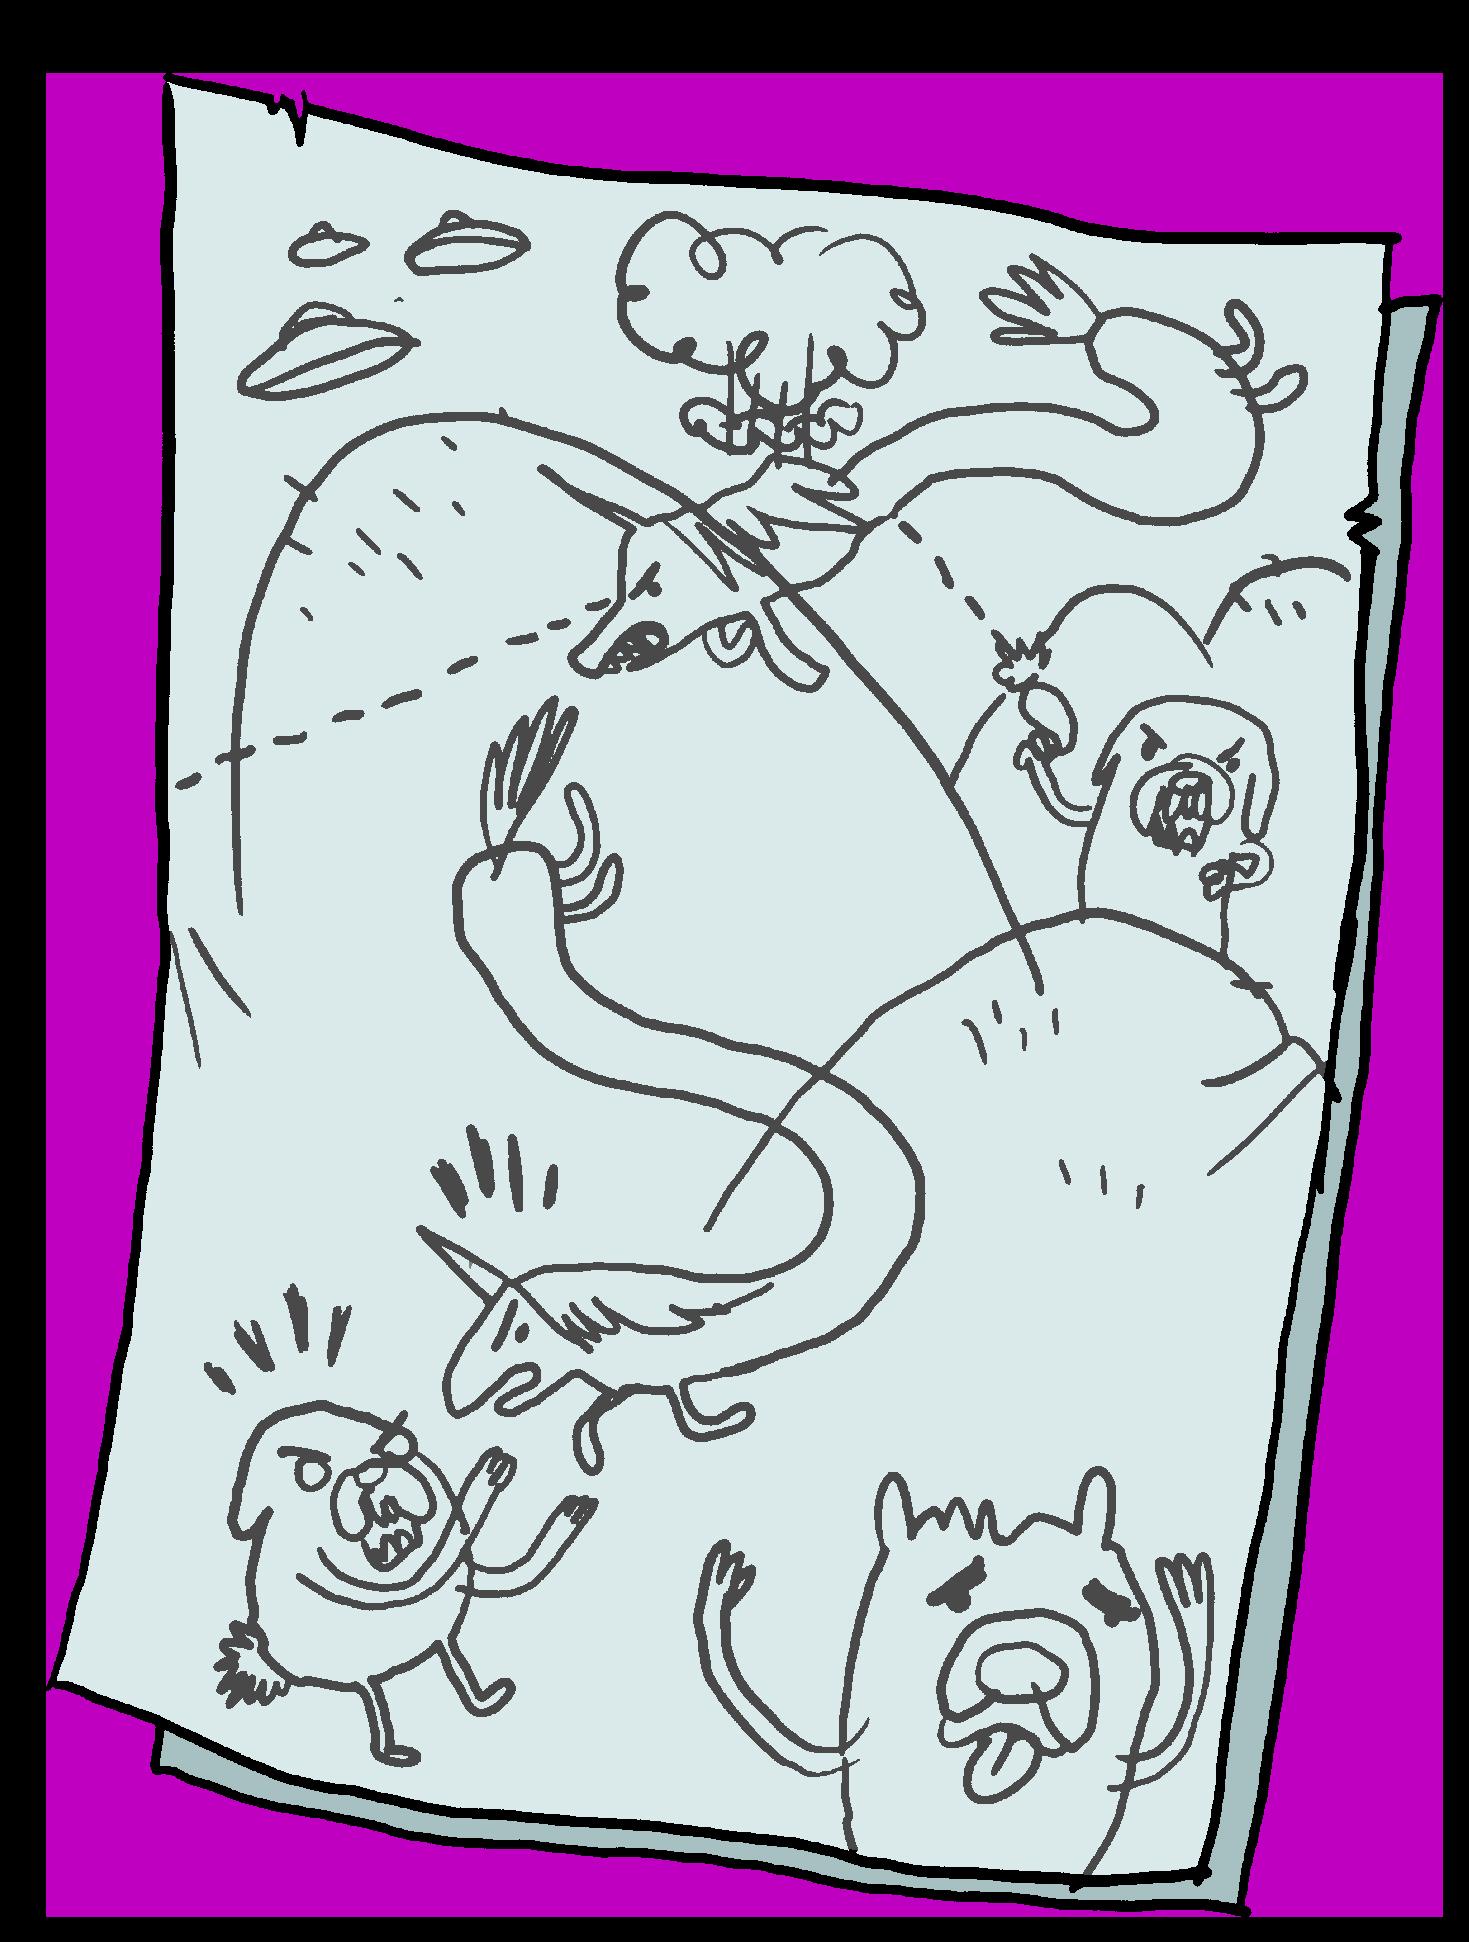 graphic black and white download Adventure drawing. Image rainicorn dog wars